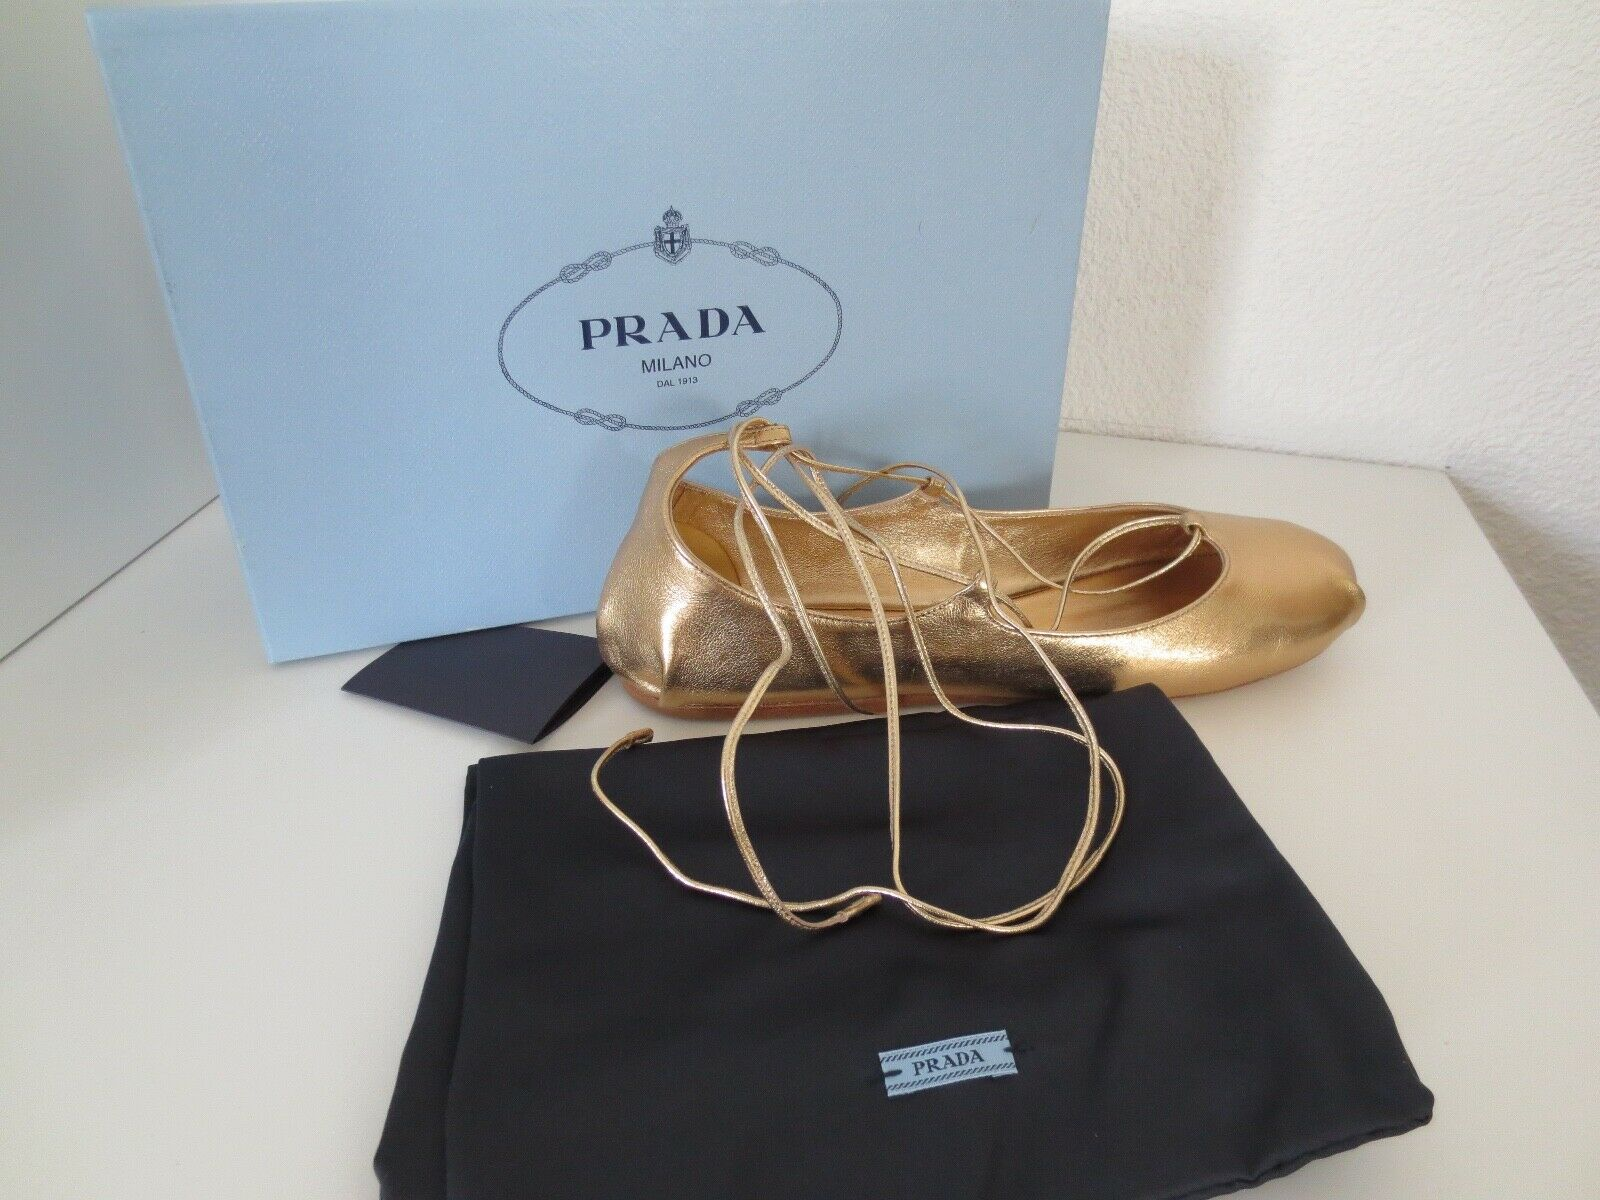 Prada señora bailarinas talla 39,5 Nappa Silk cuero oro zapatos zapatos zapatos bailarina nuevo e6d274